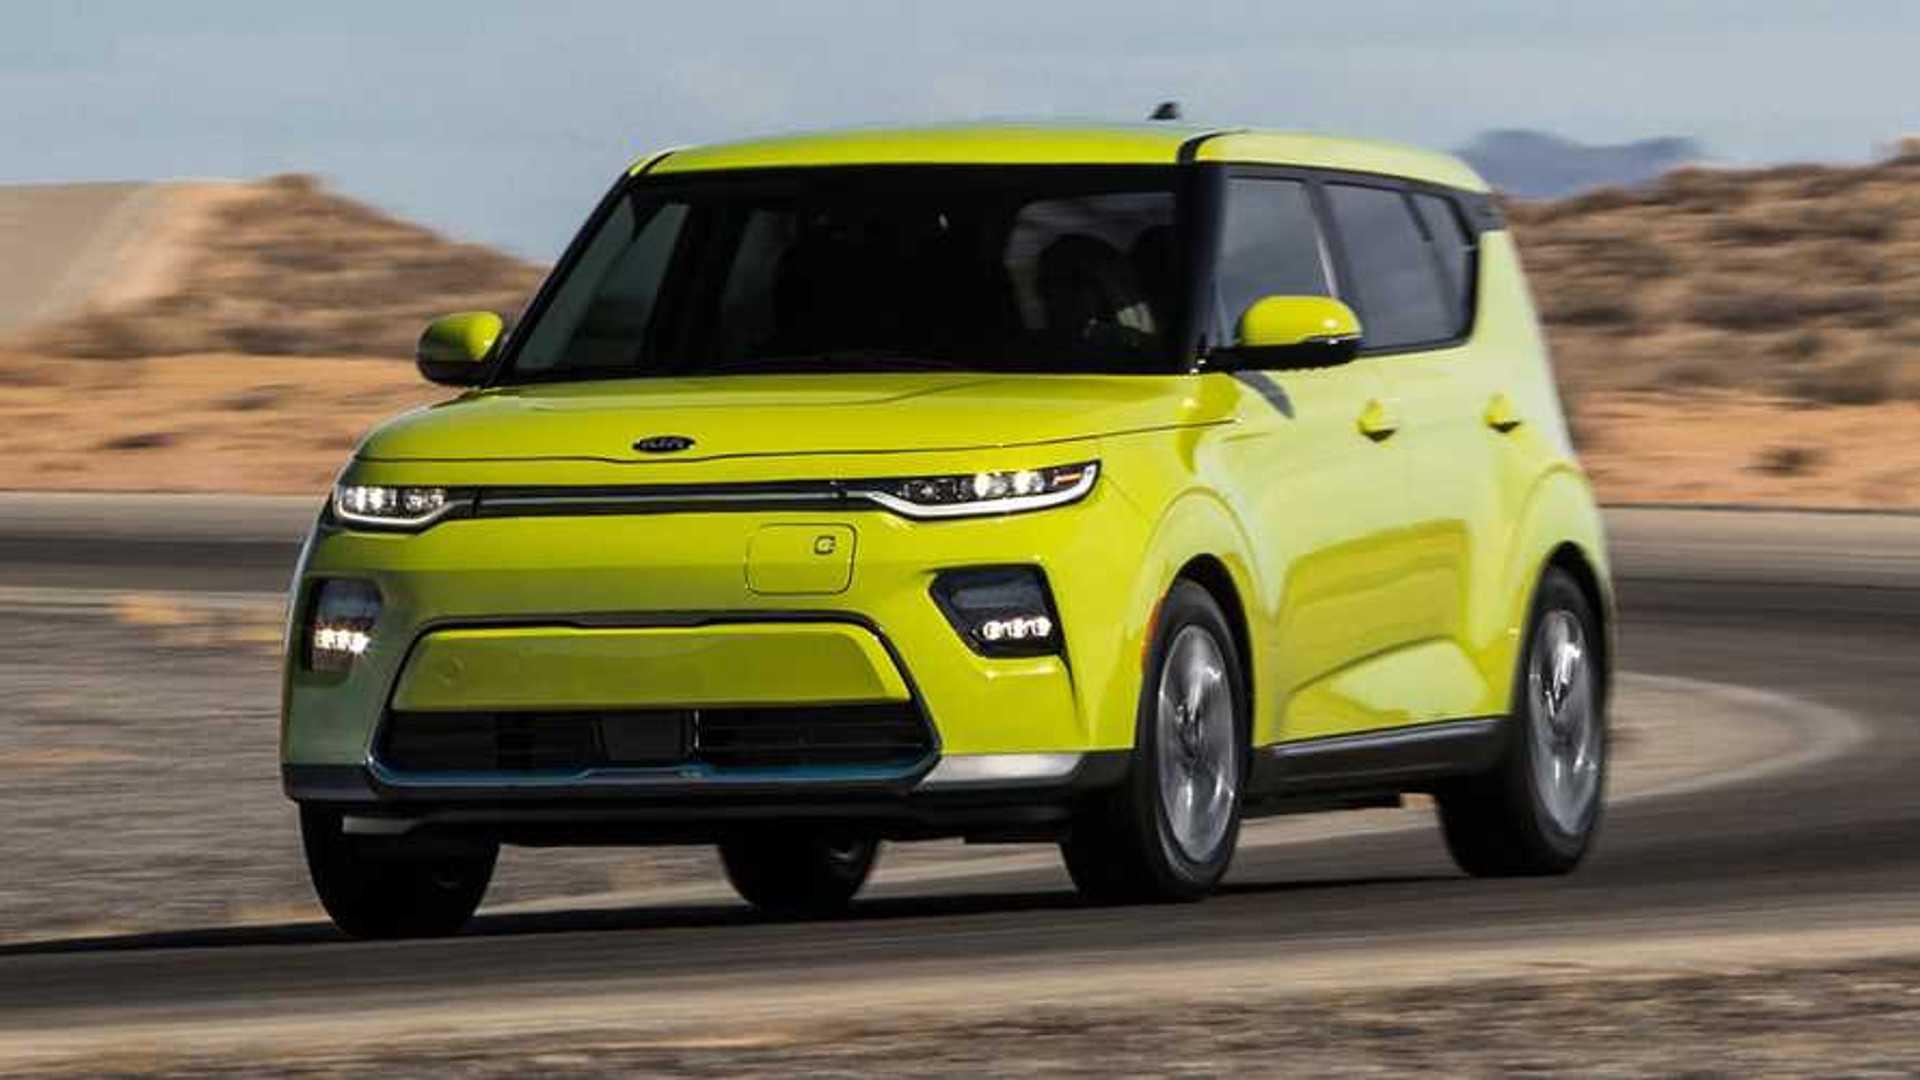 2020 Kia Soul Electric Gets 243 Mile Epa Range Rating